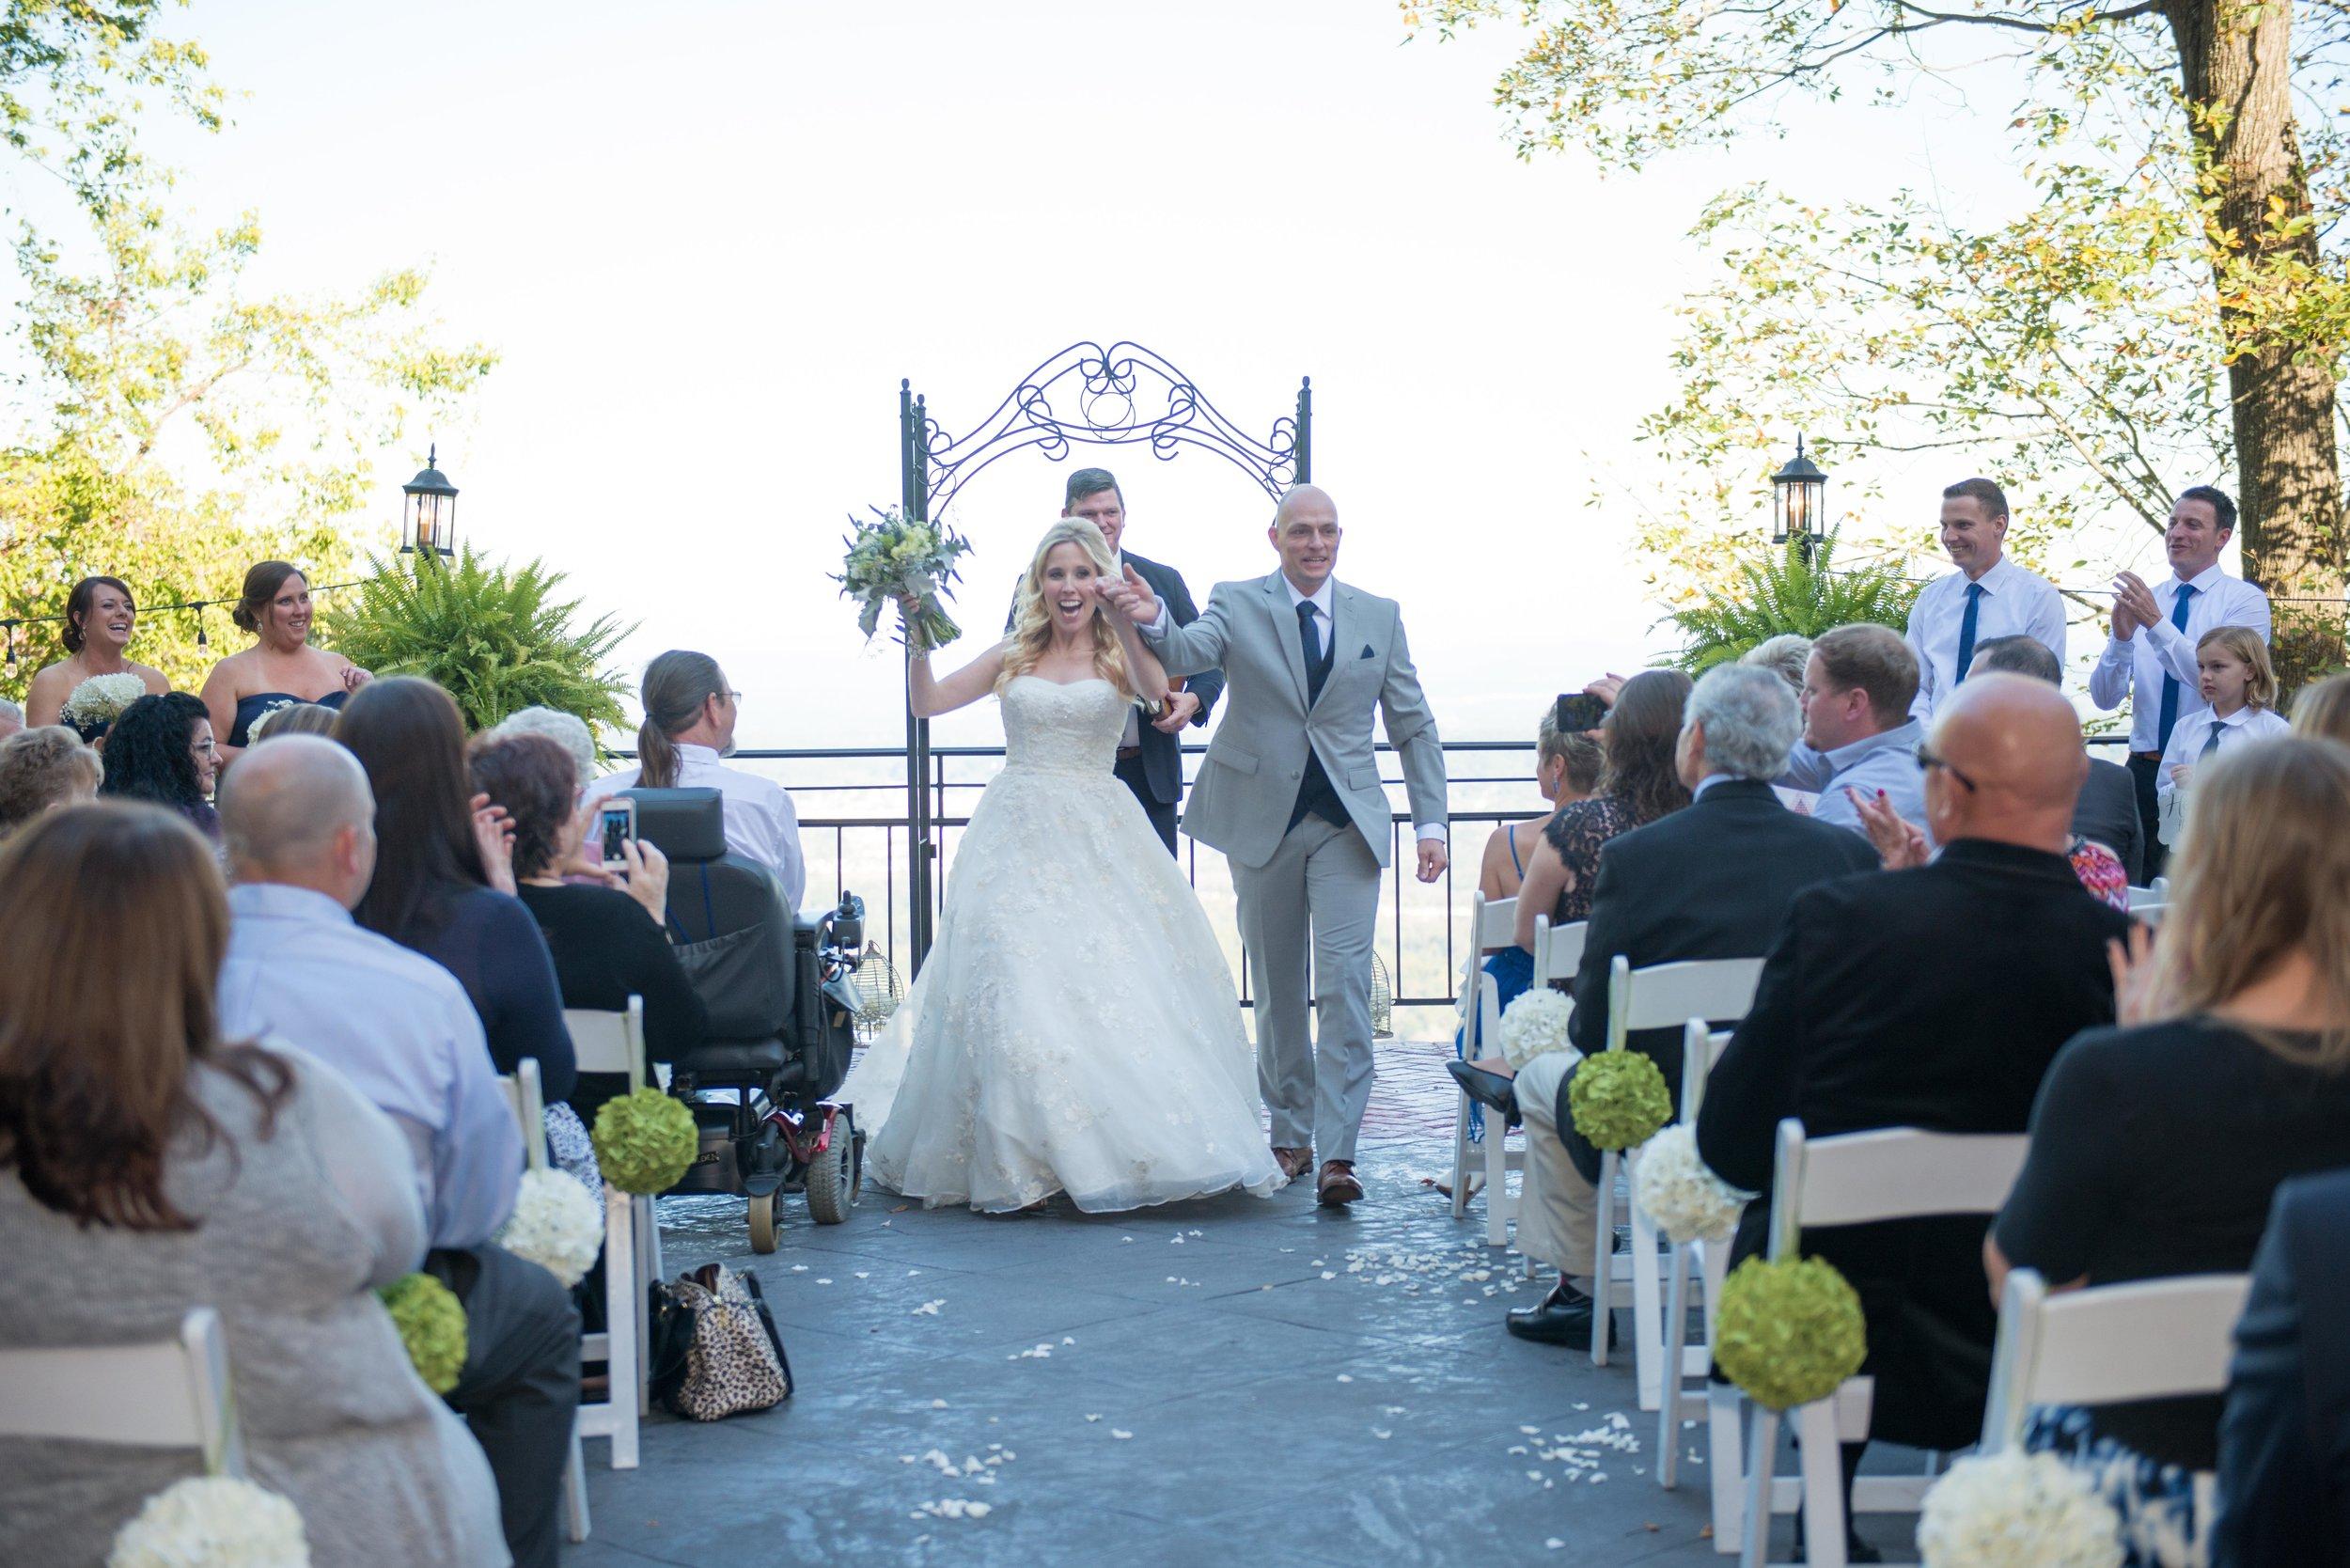 00001_Kuhnert-Wedding-52.jpg